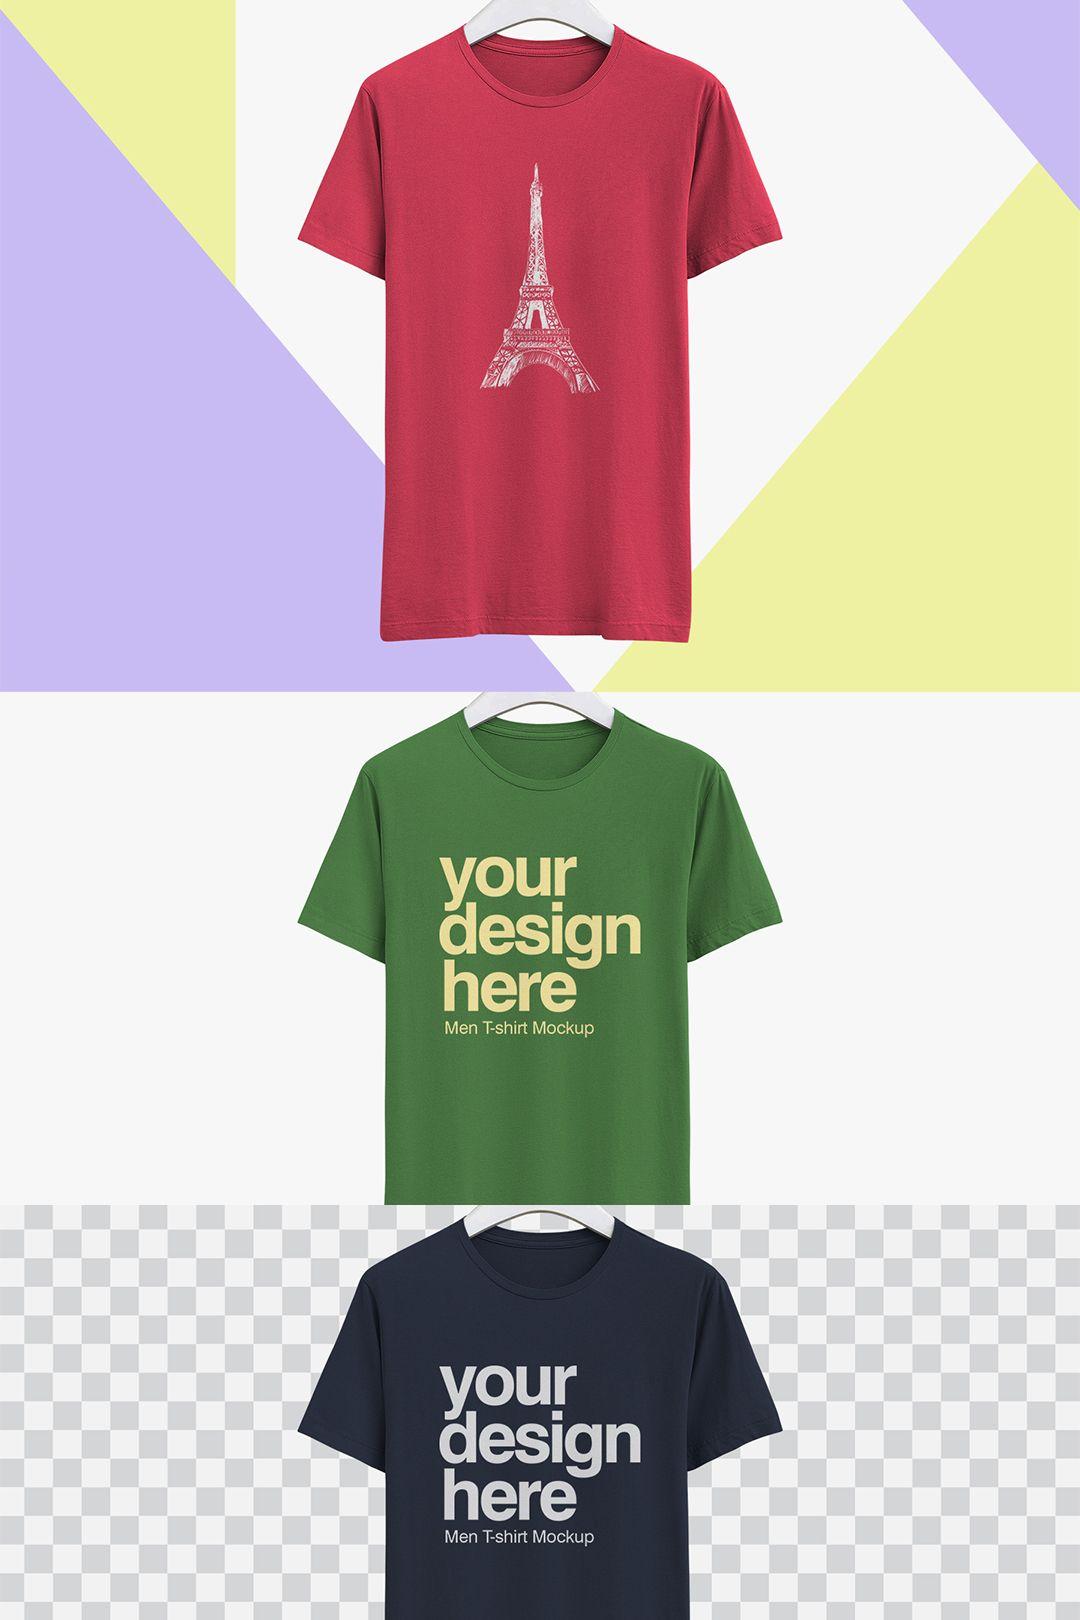 Download Free Realistic T Shirt Mockup Shirt Mockup T Shirt Tshirt Mockup